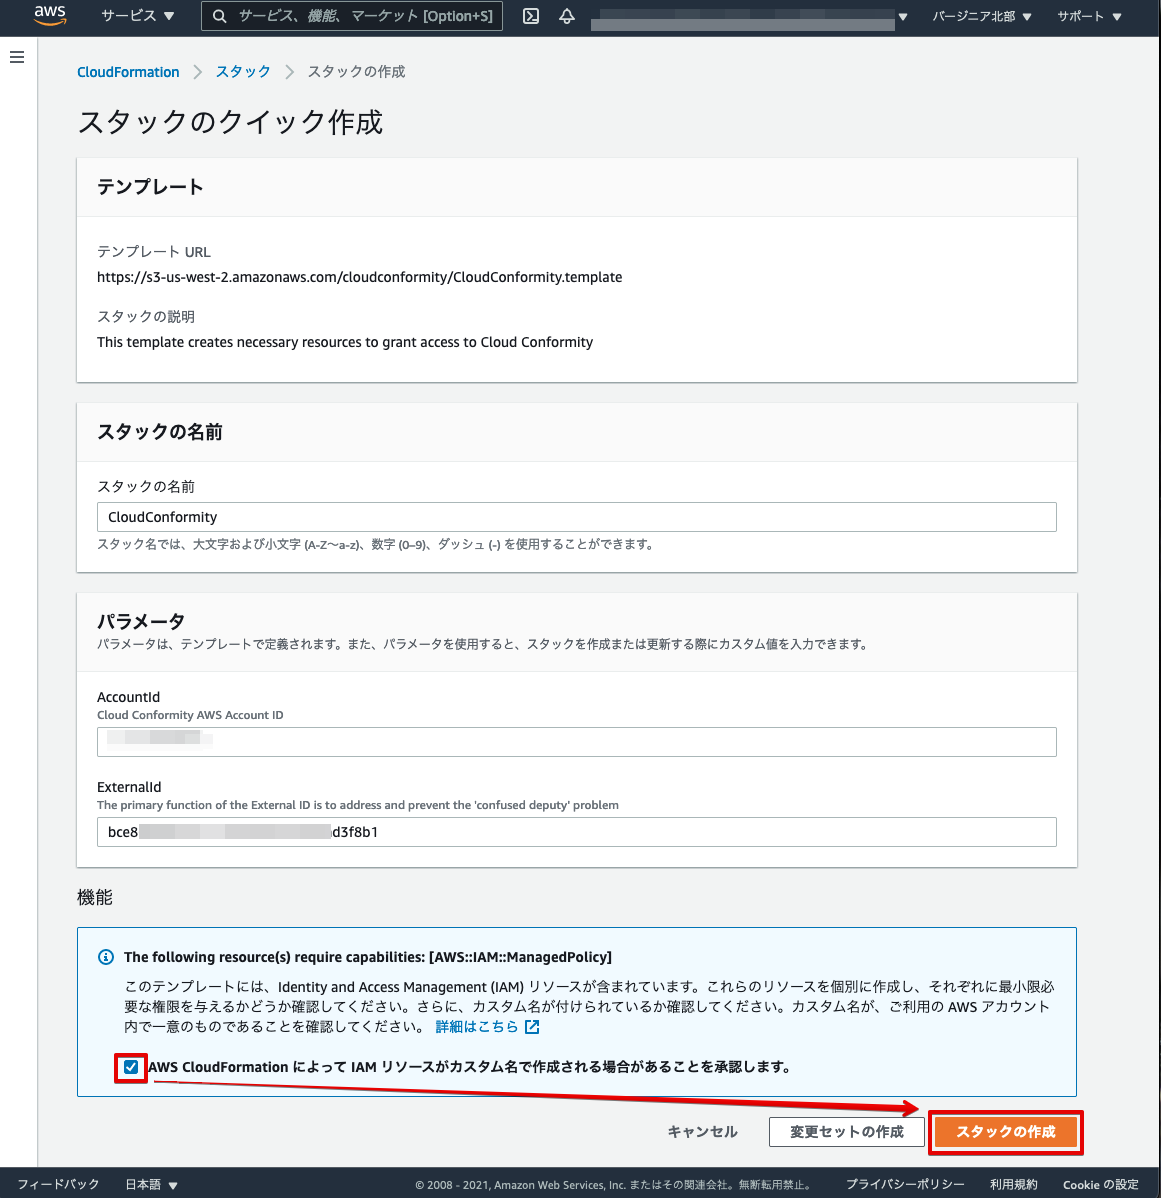 f:id:swx-tamura:20211007221255p:plain